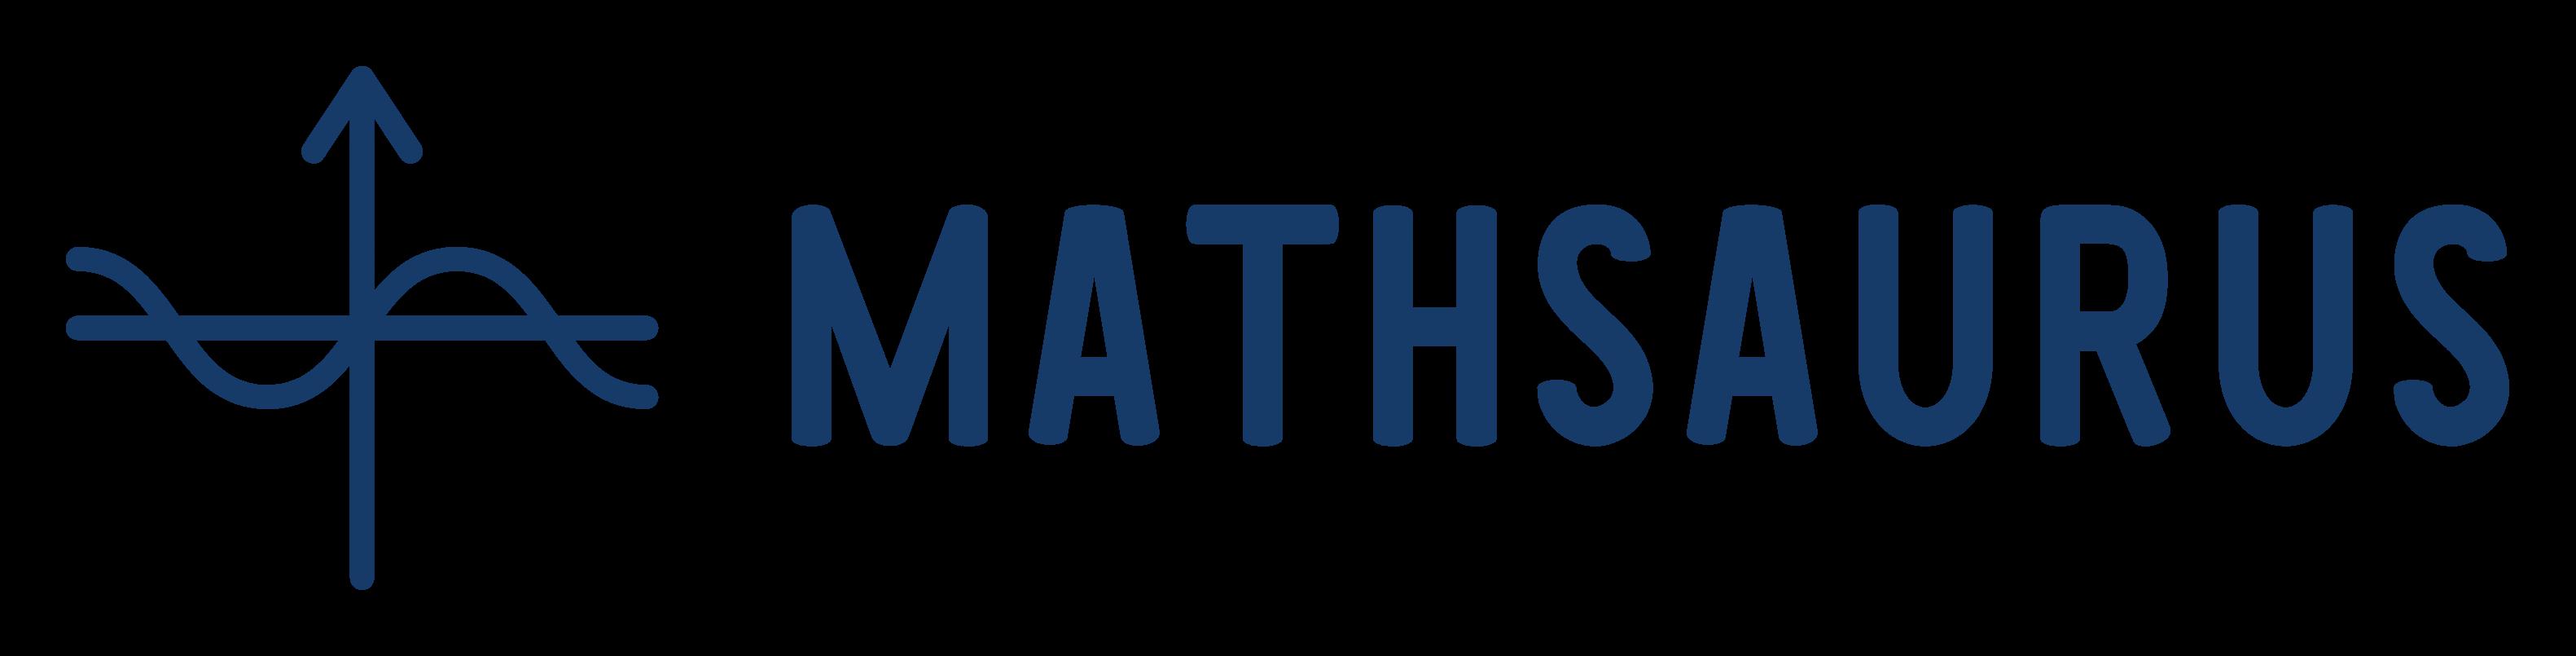 Mathsaurus